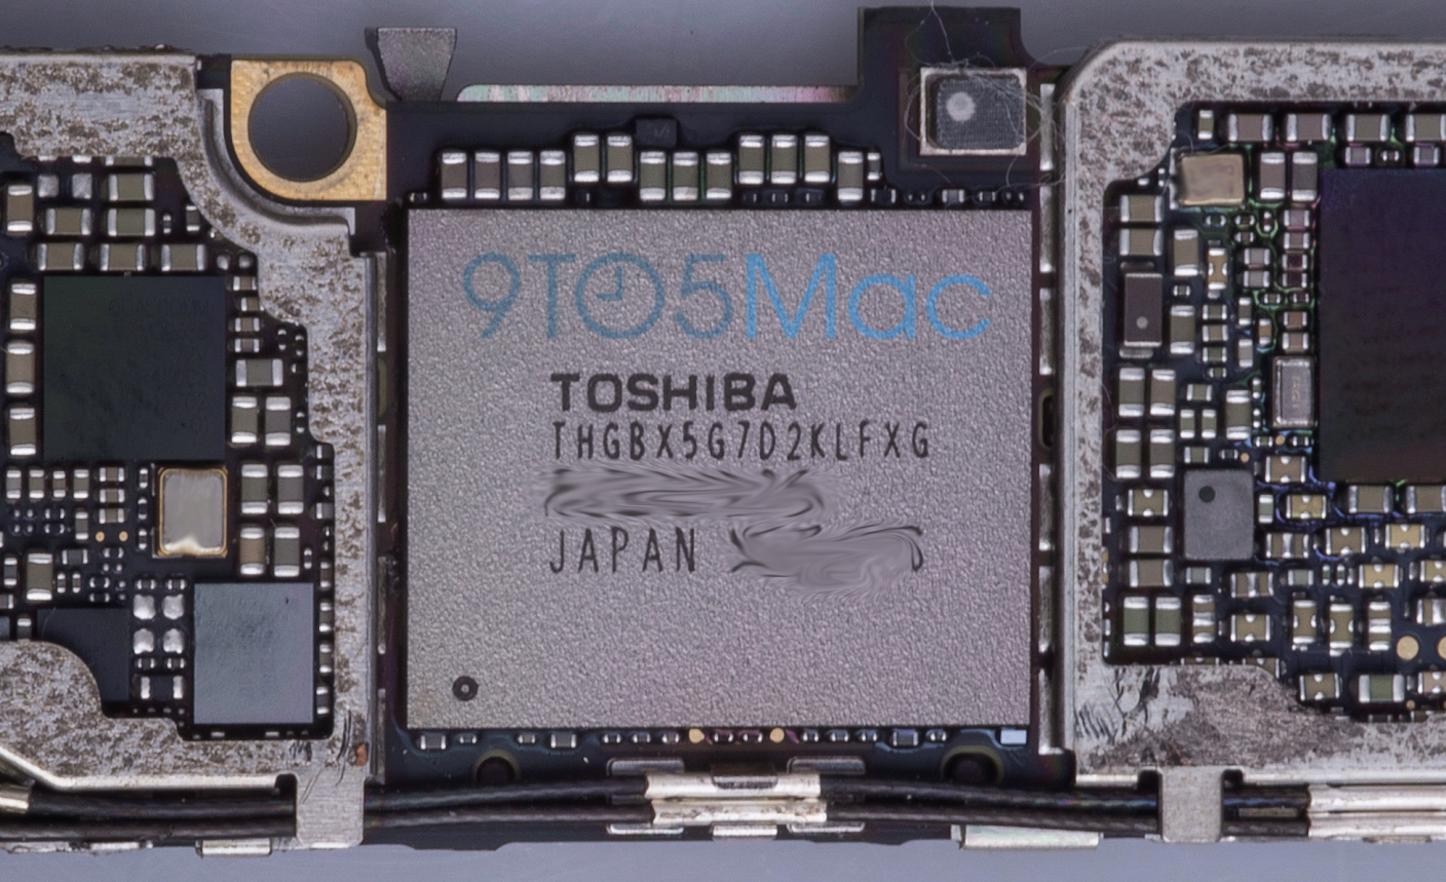 Toshiba Storage Chip 9To5Mac